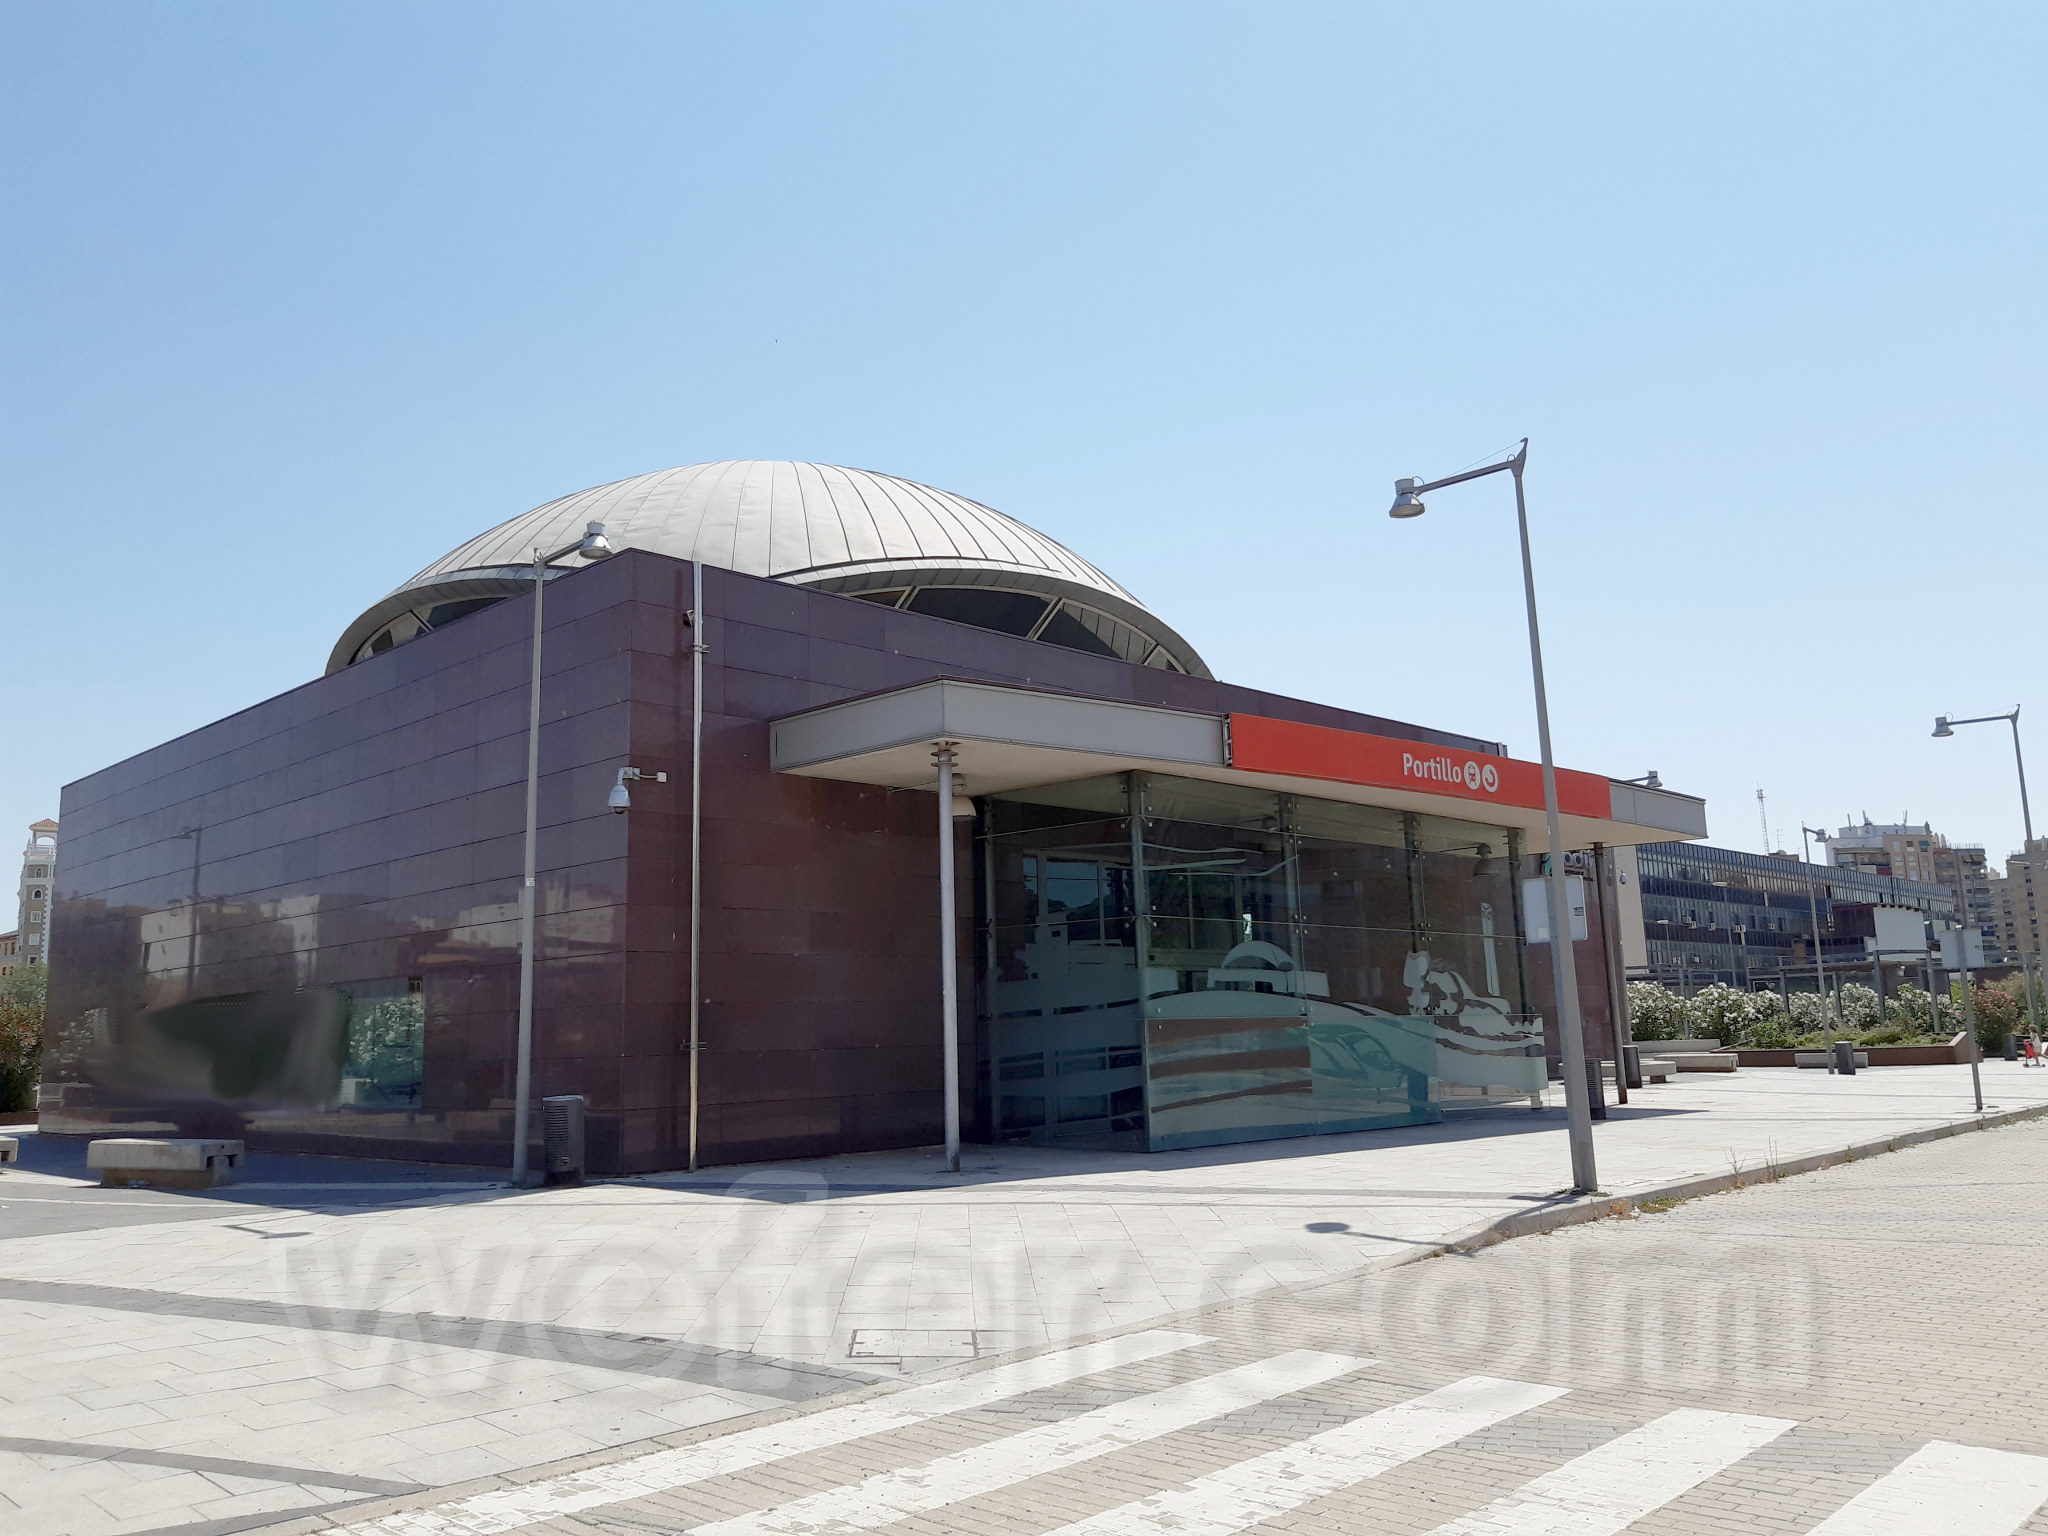 Renfe / ADIF: Zaragoza - El Portillo